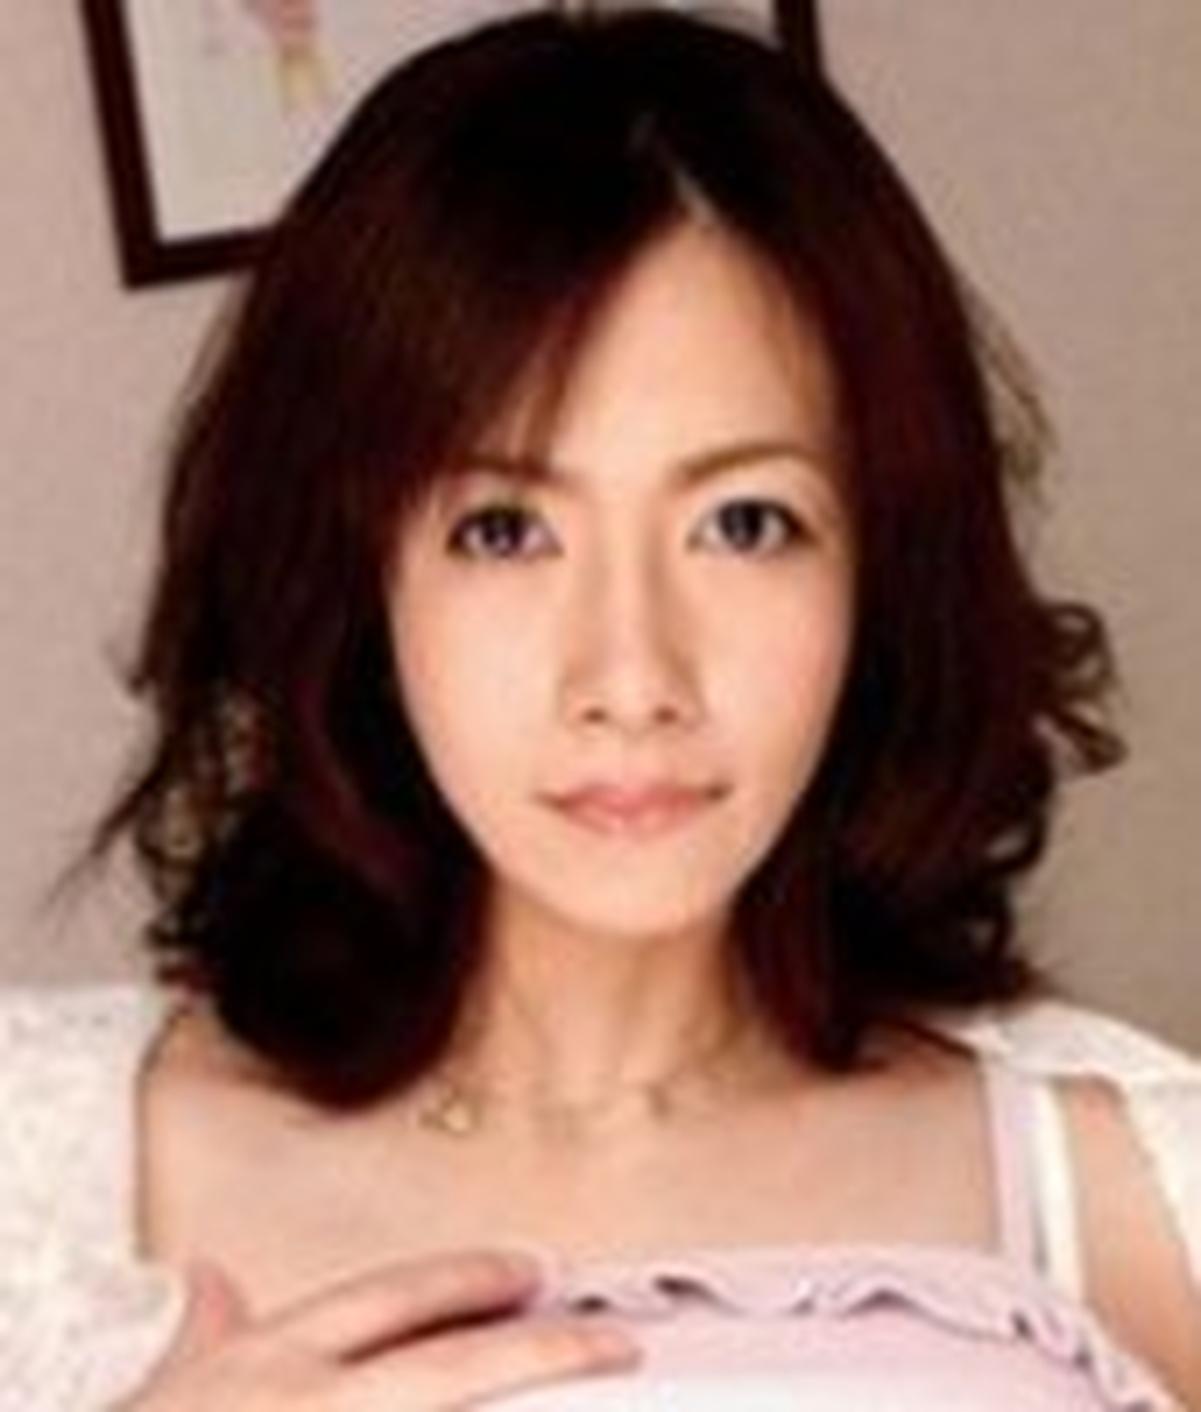 Yukie Aono